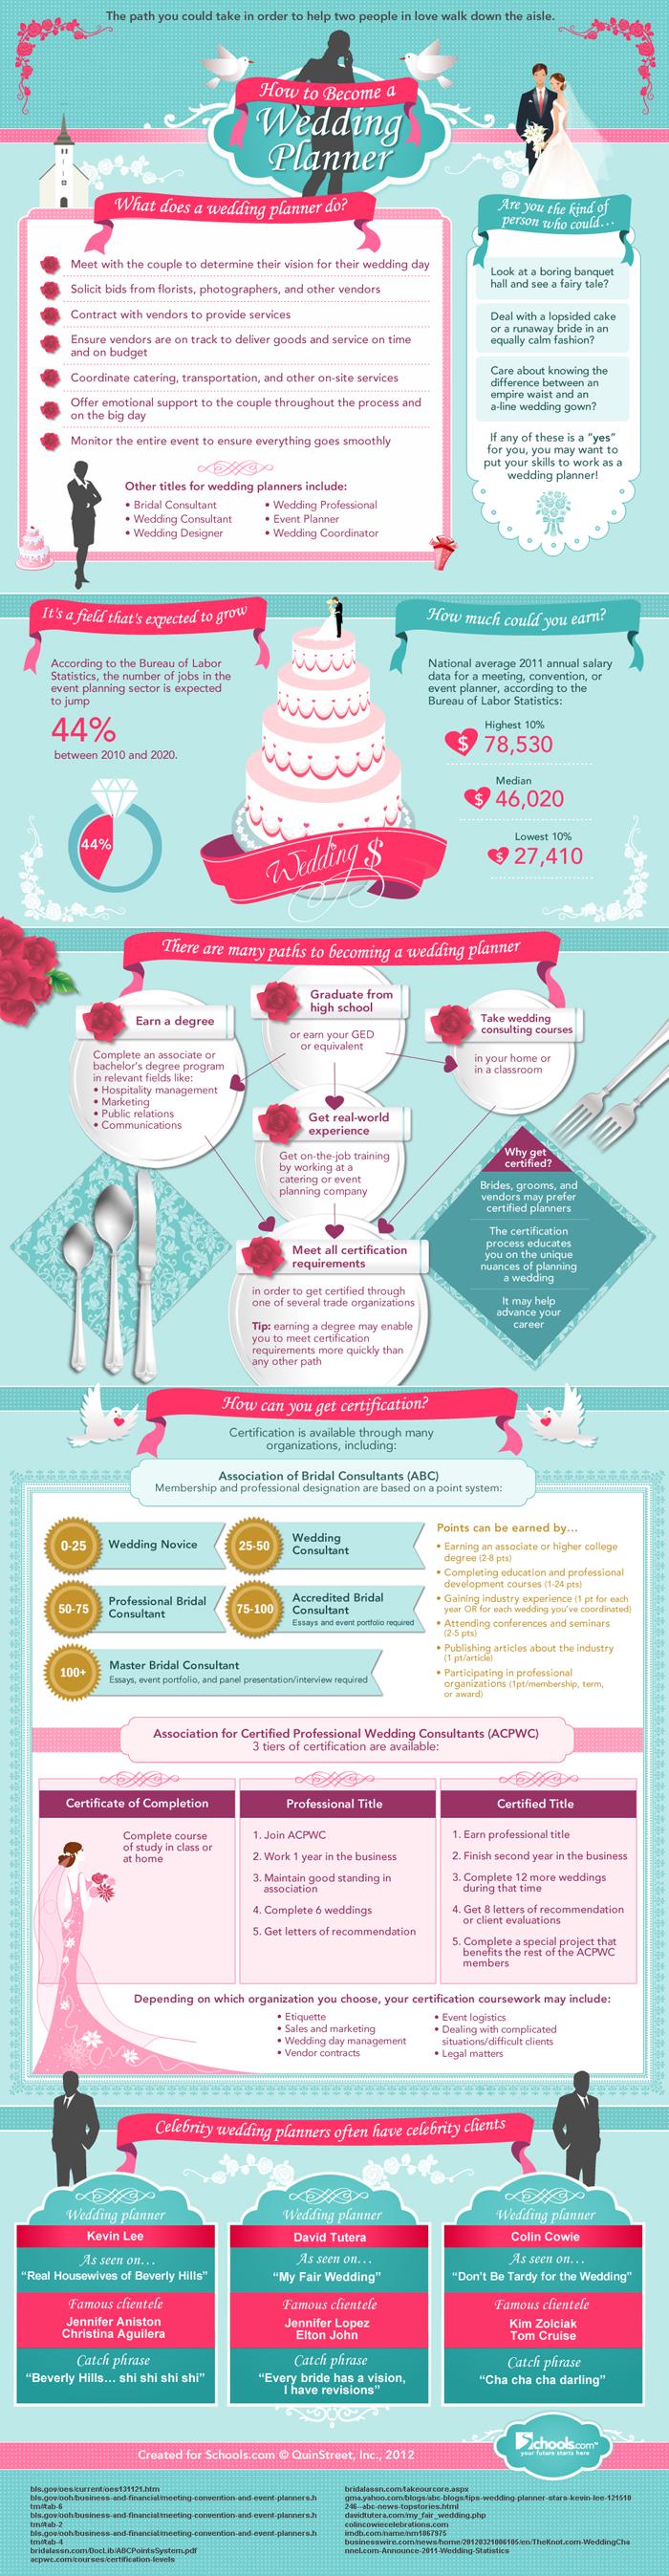 Uncategorized – Wedding knowledge 1-2-3